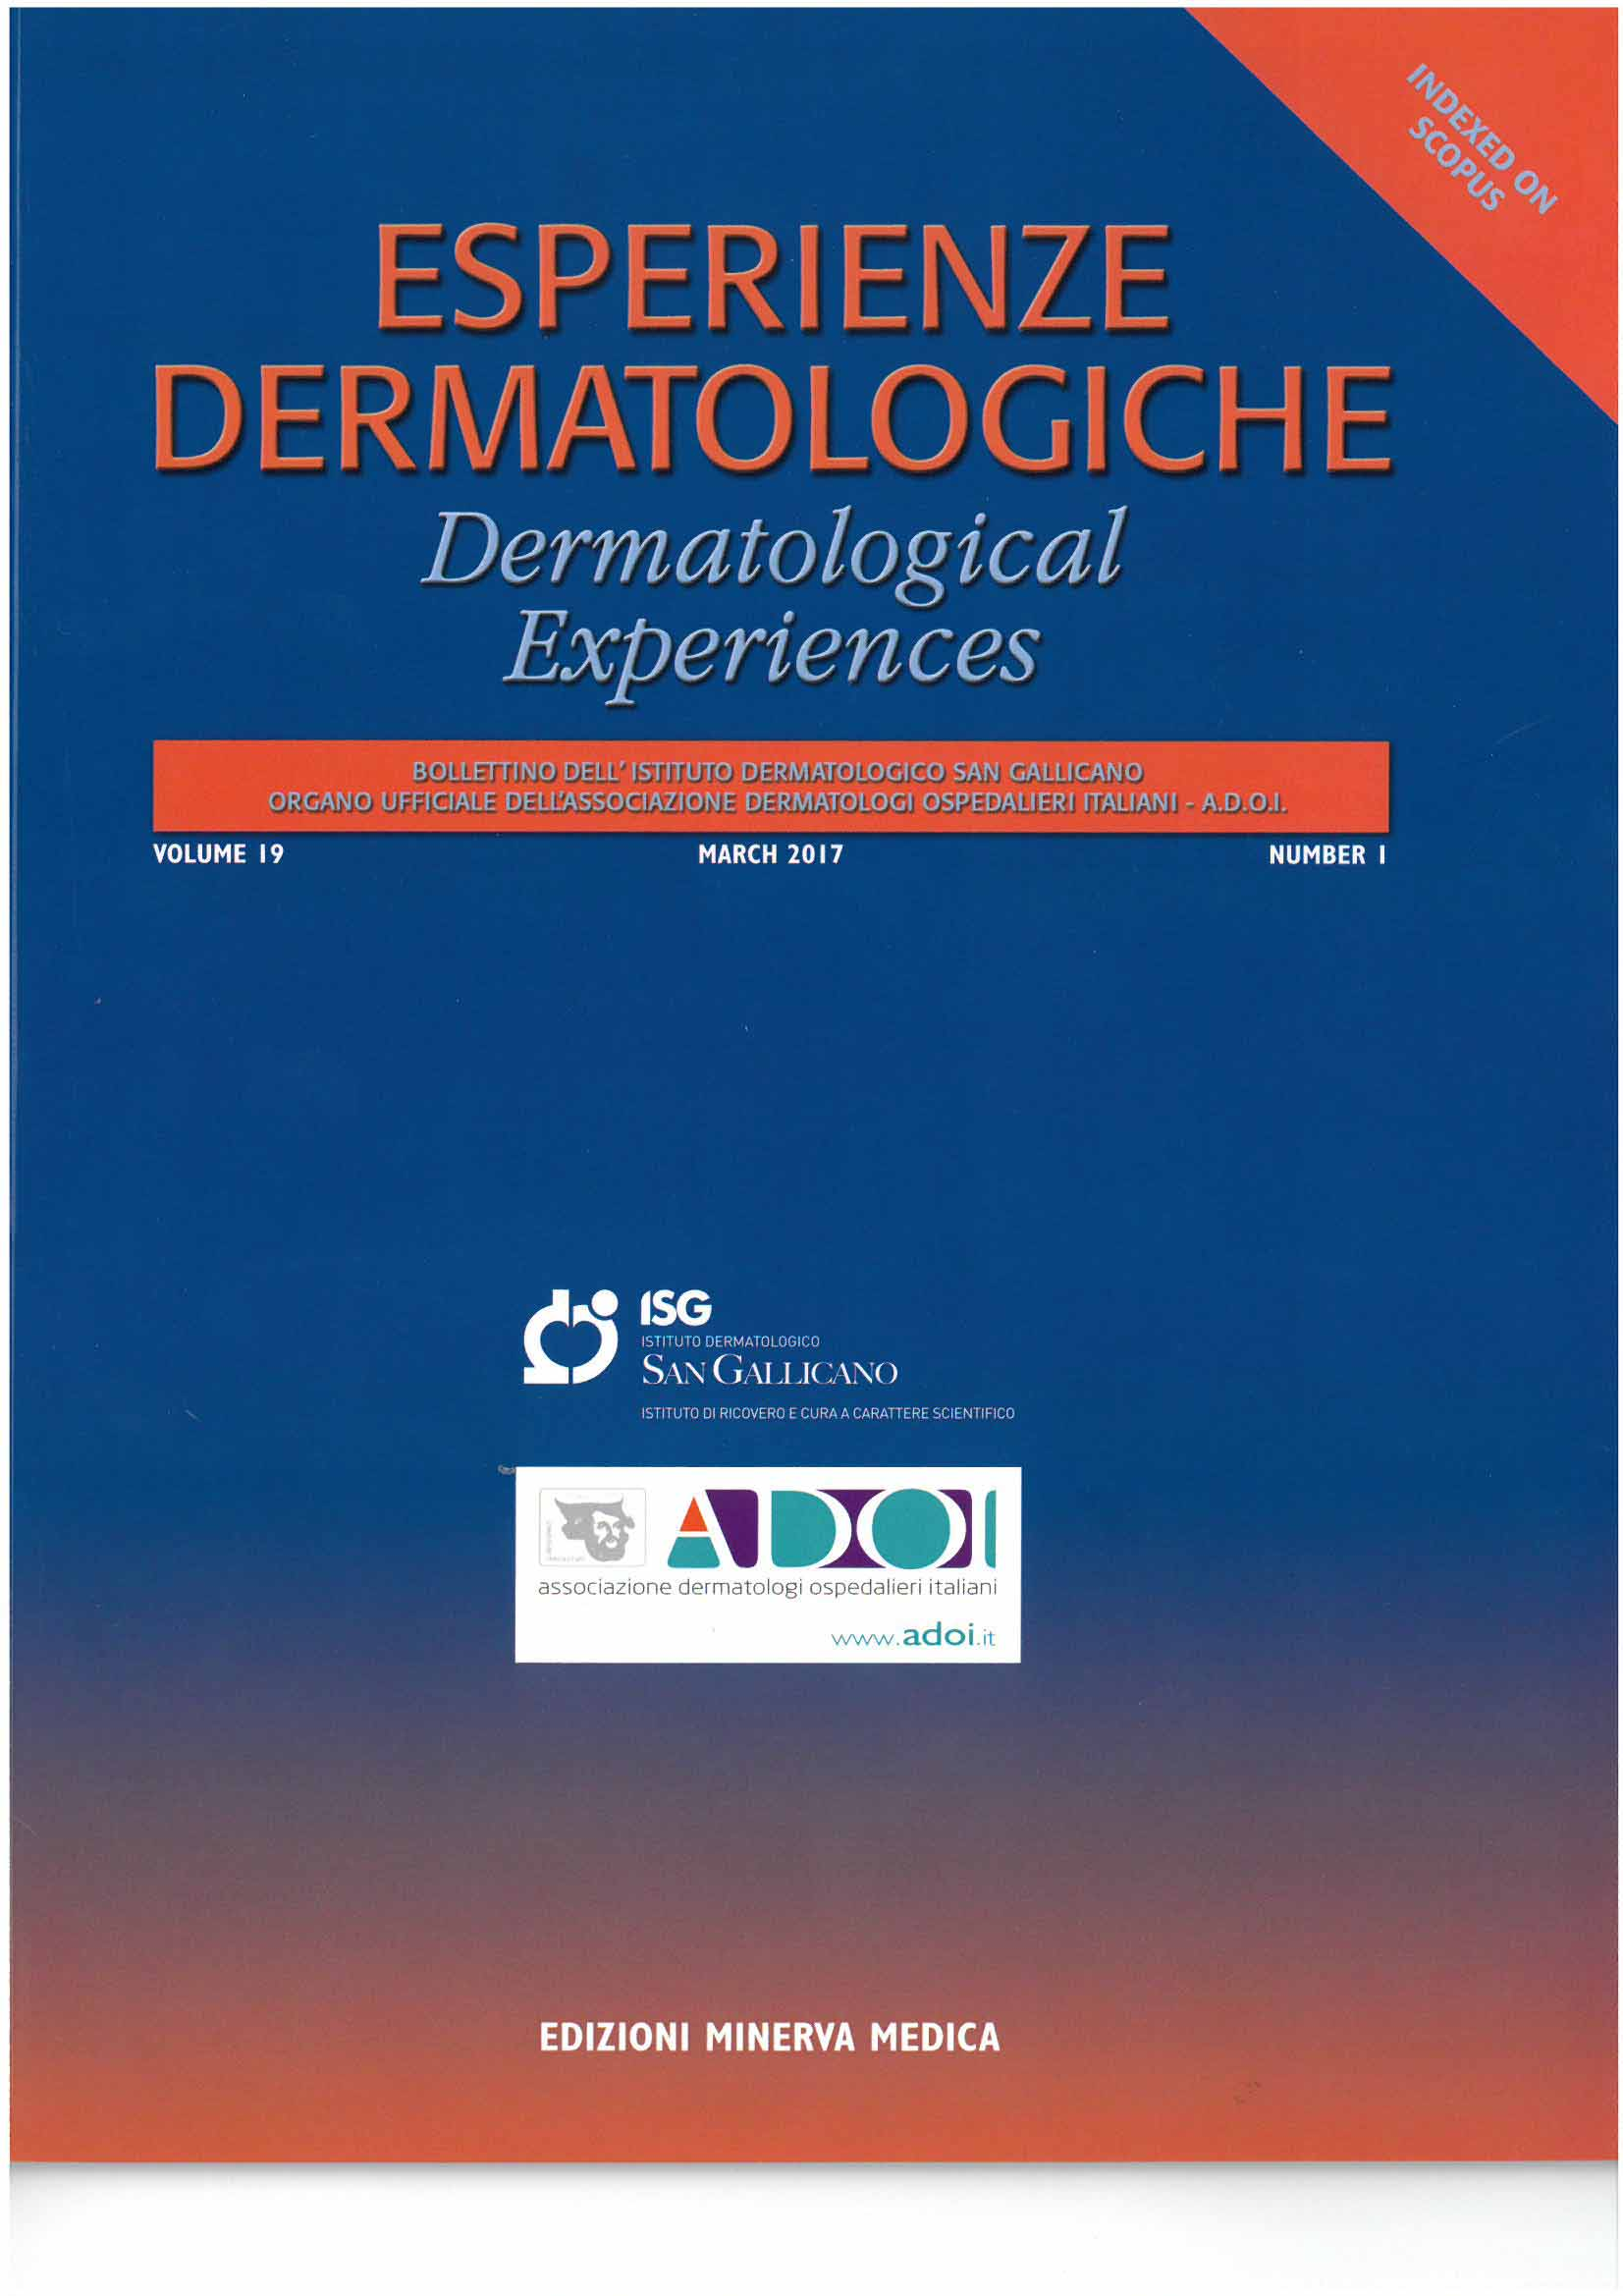 rivista esperienze dermatologiche